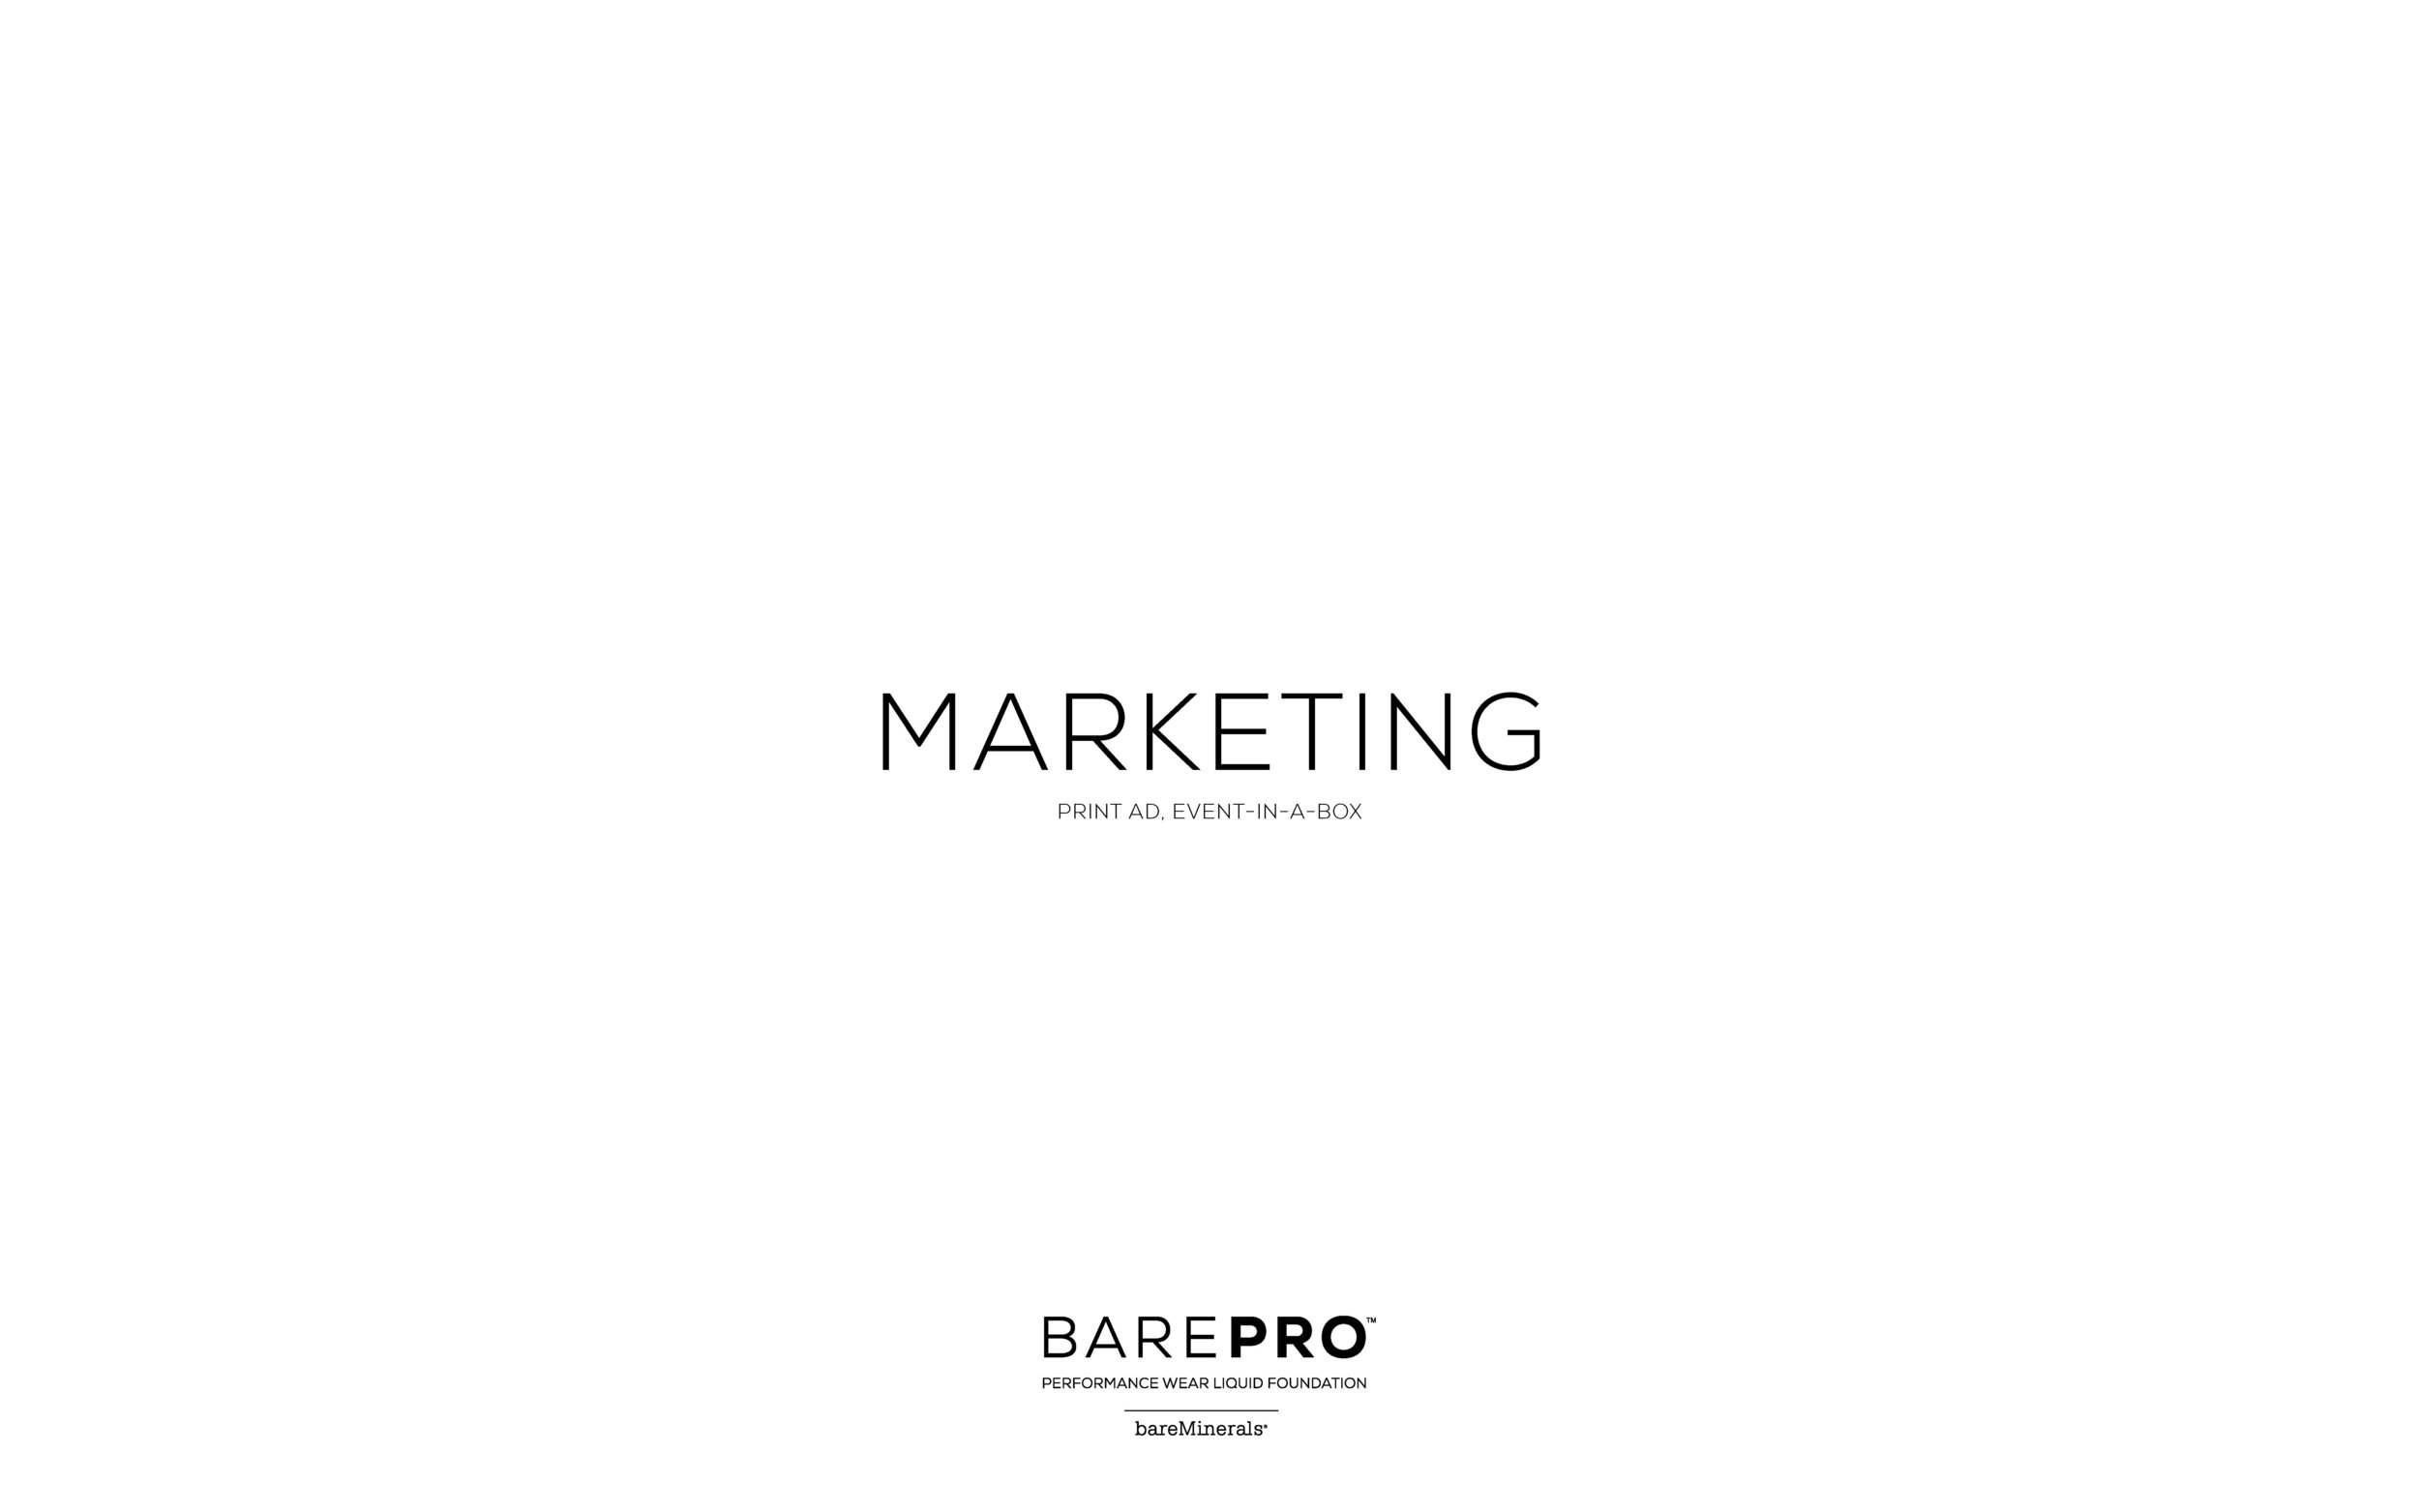 barePro_Liquid Foundation_Toolkit_Page_34.jpg